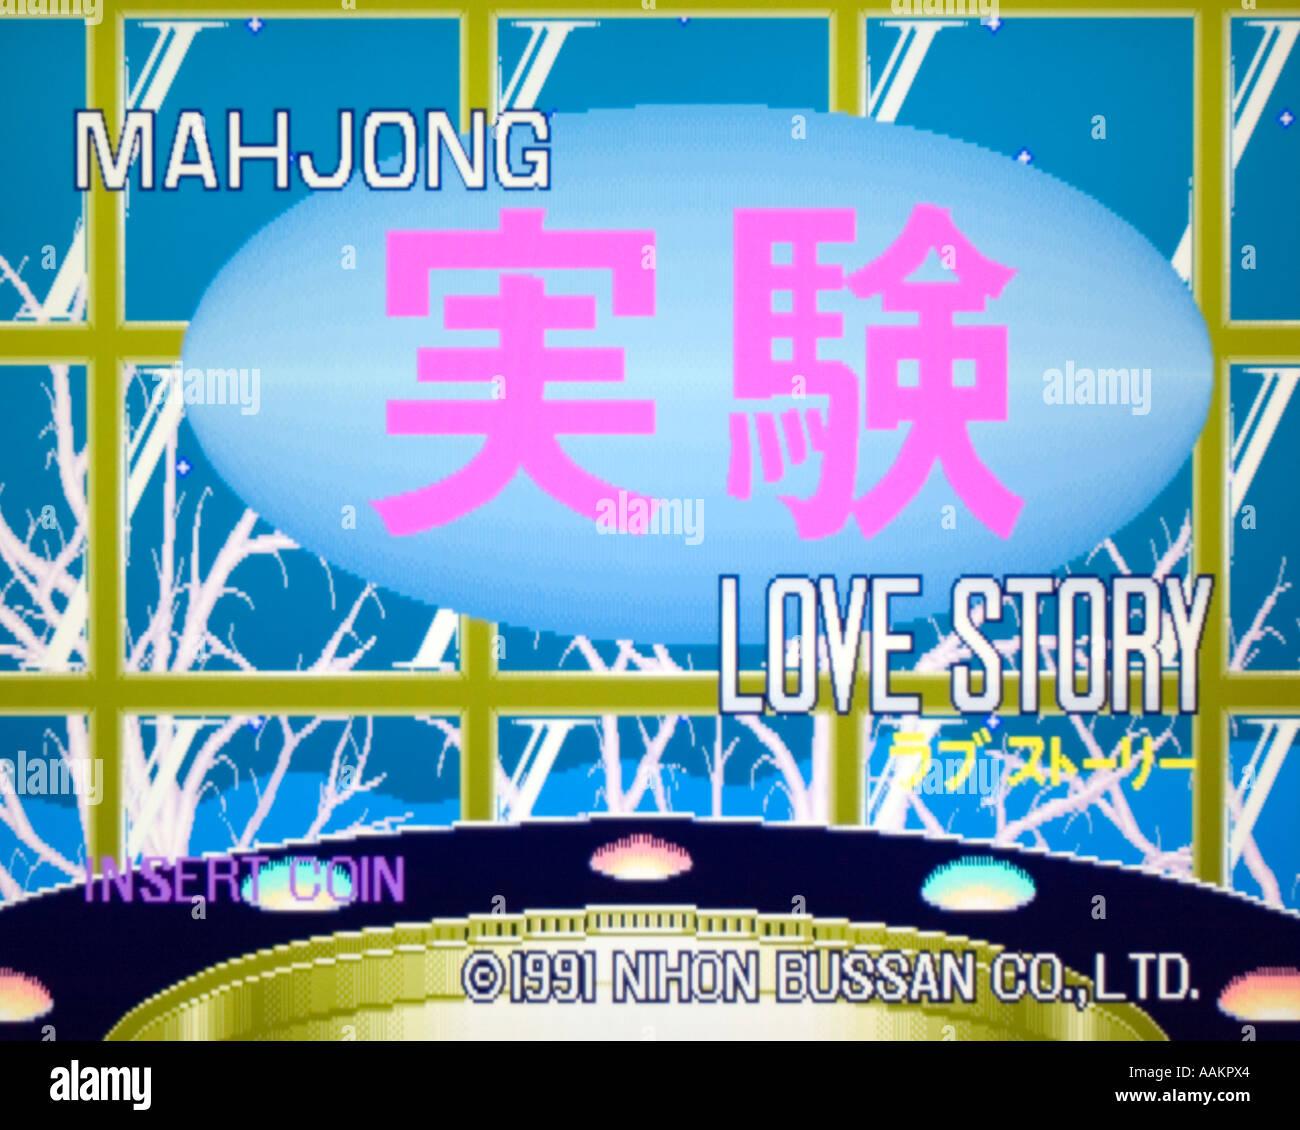 Mahjong Jikken Love Story Nihon Bussan Co Ltd Nichibutsu 1991 vintage arcade videogame screenshot - EDITORIAL USE ONLY - Stock Image